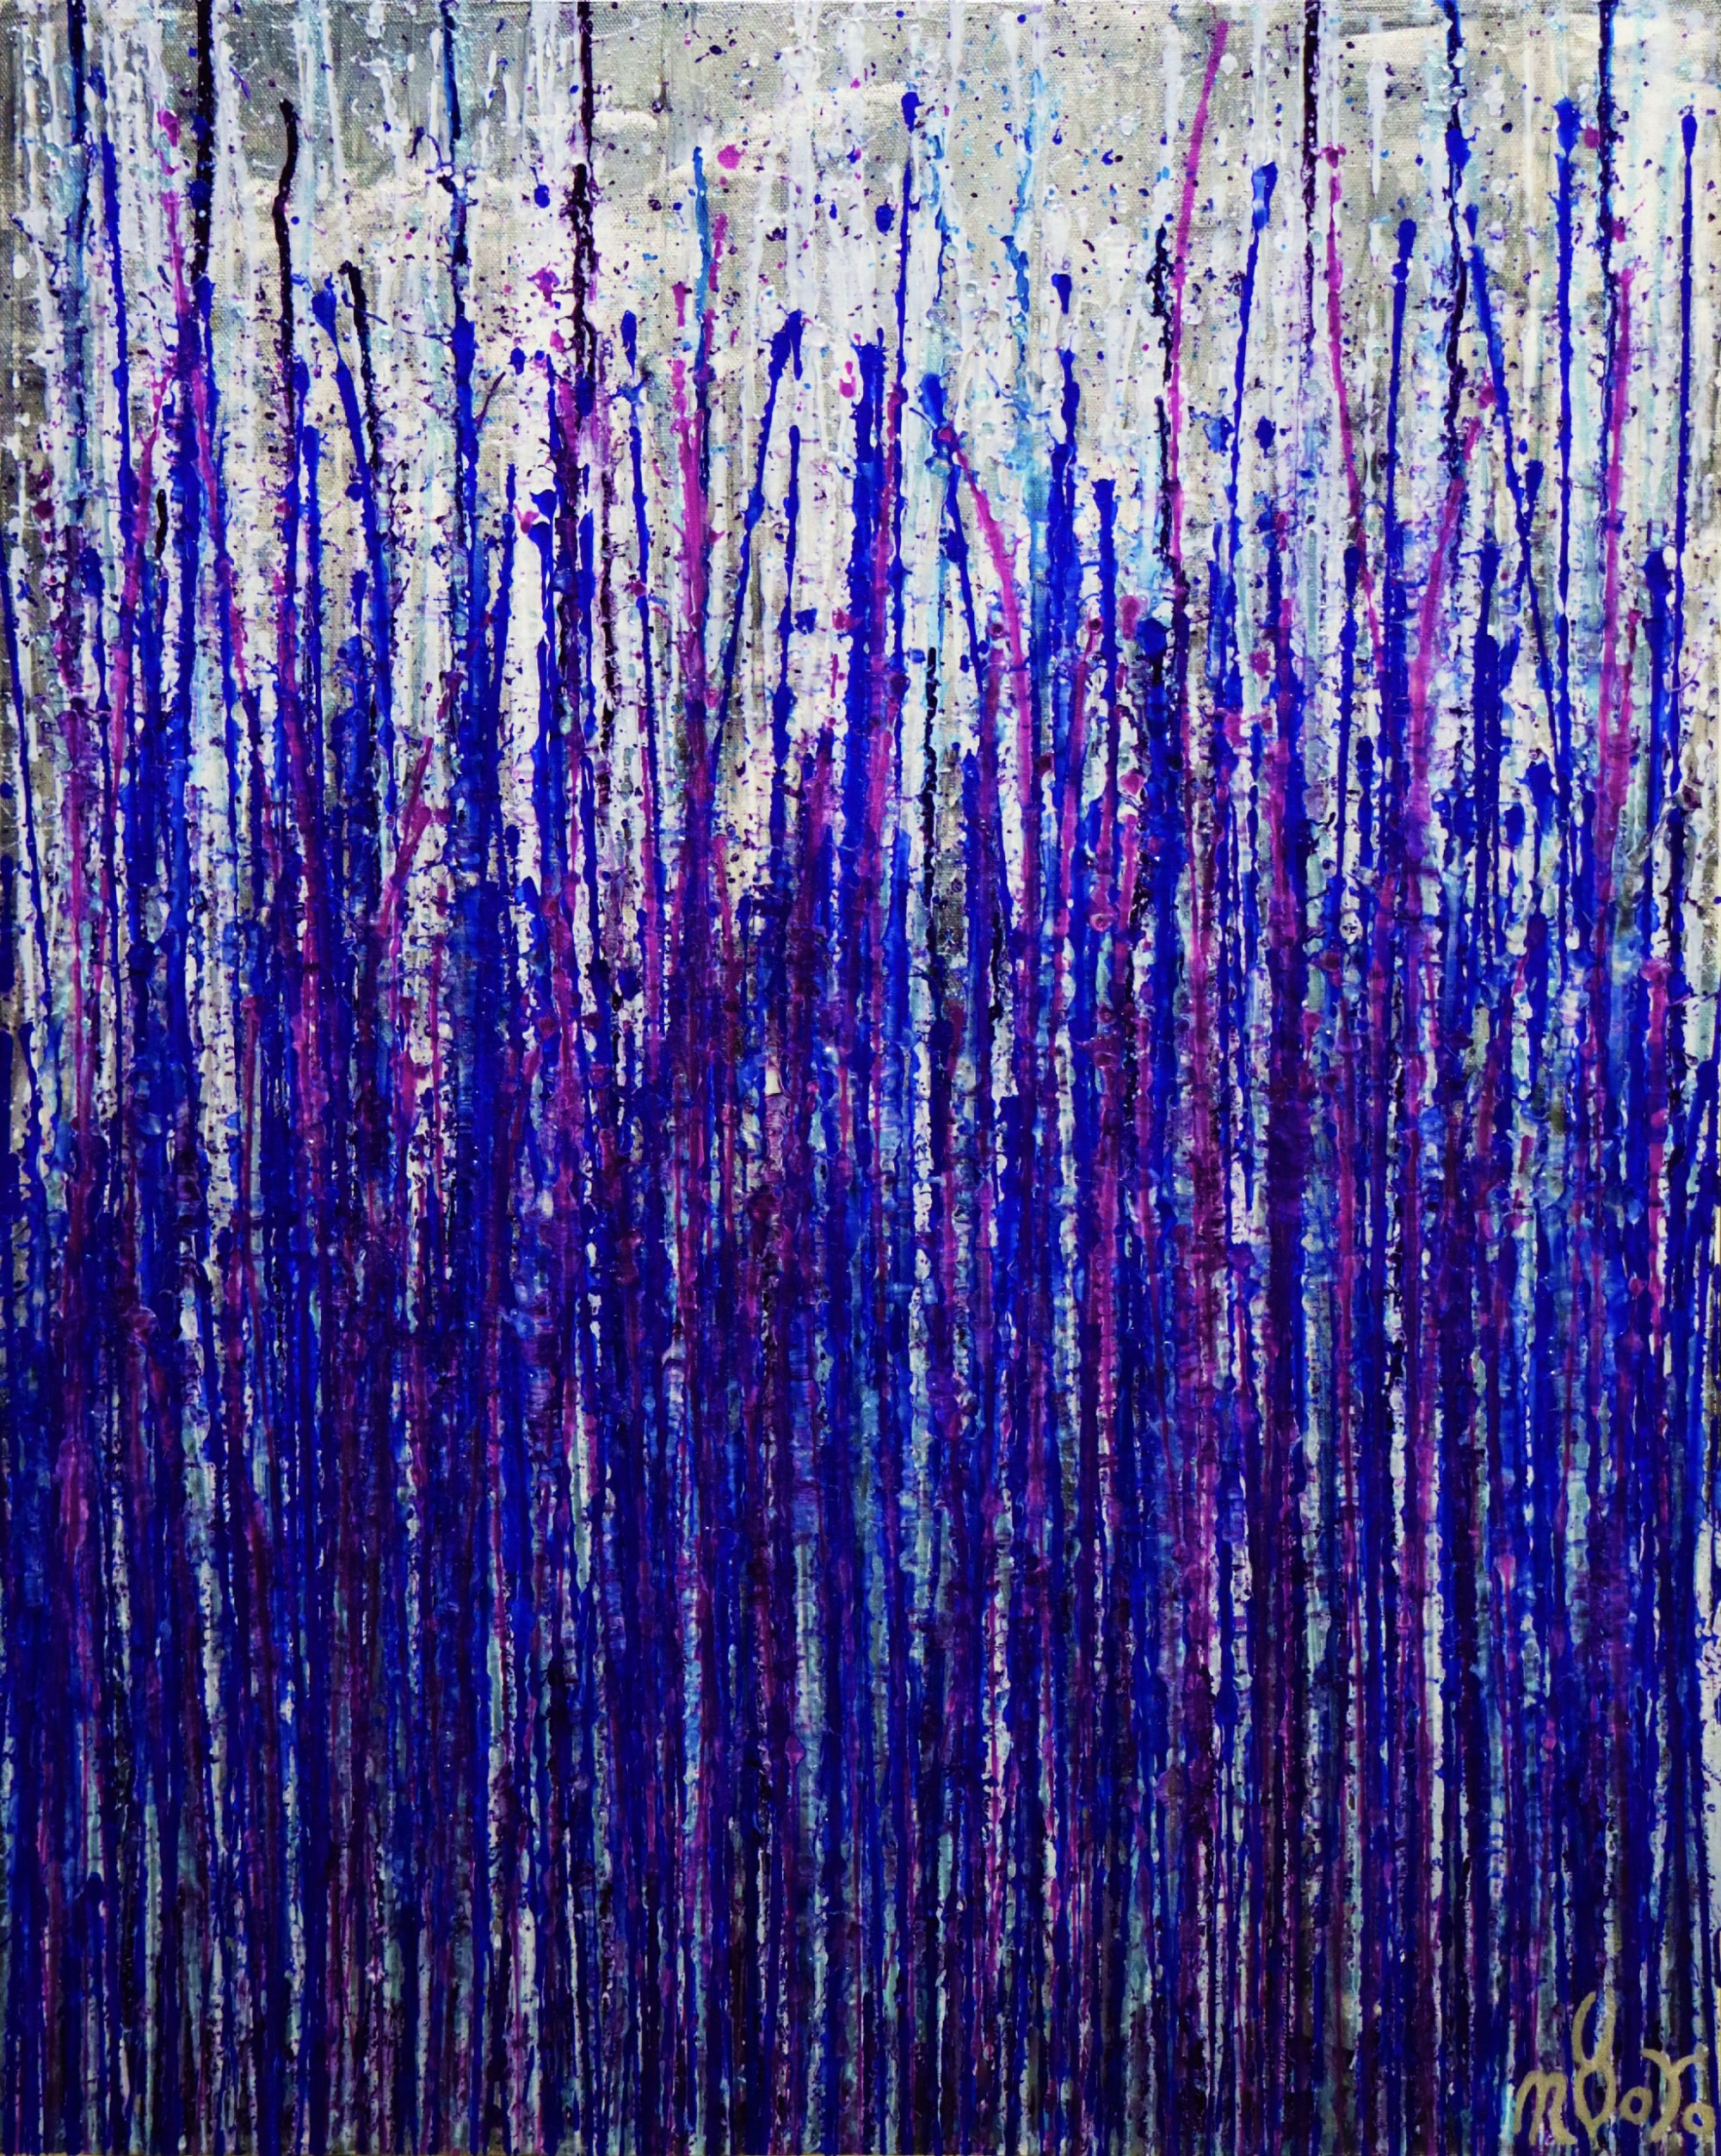 Full canvas - Daring Spectra (Purple Drizzles) (2020) by Nestor Toro